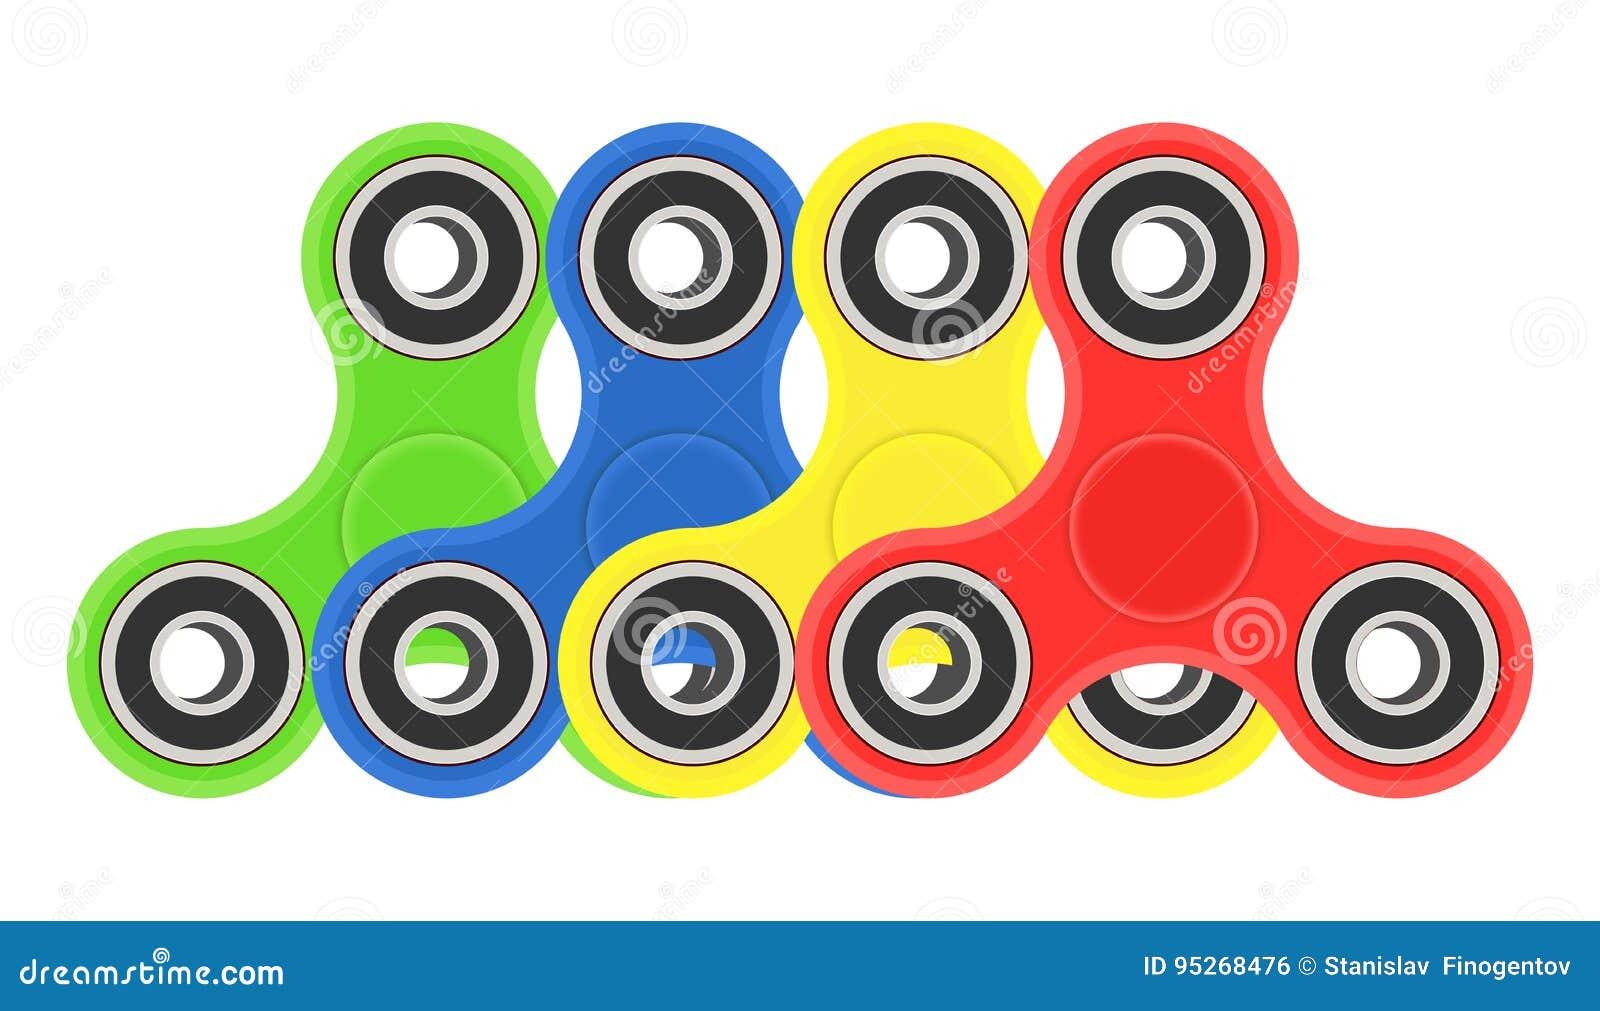 Download Color Hand Fidget Spinners Set Vector Illustration On White Background Stock